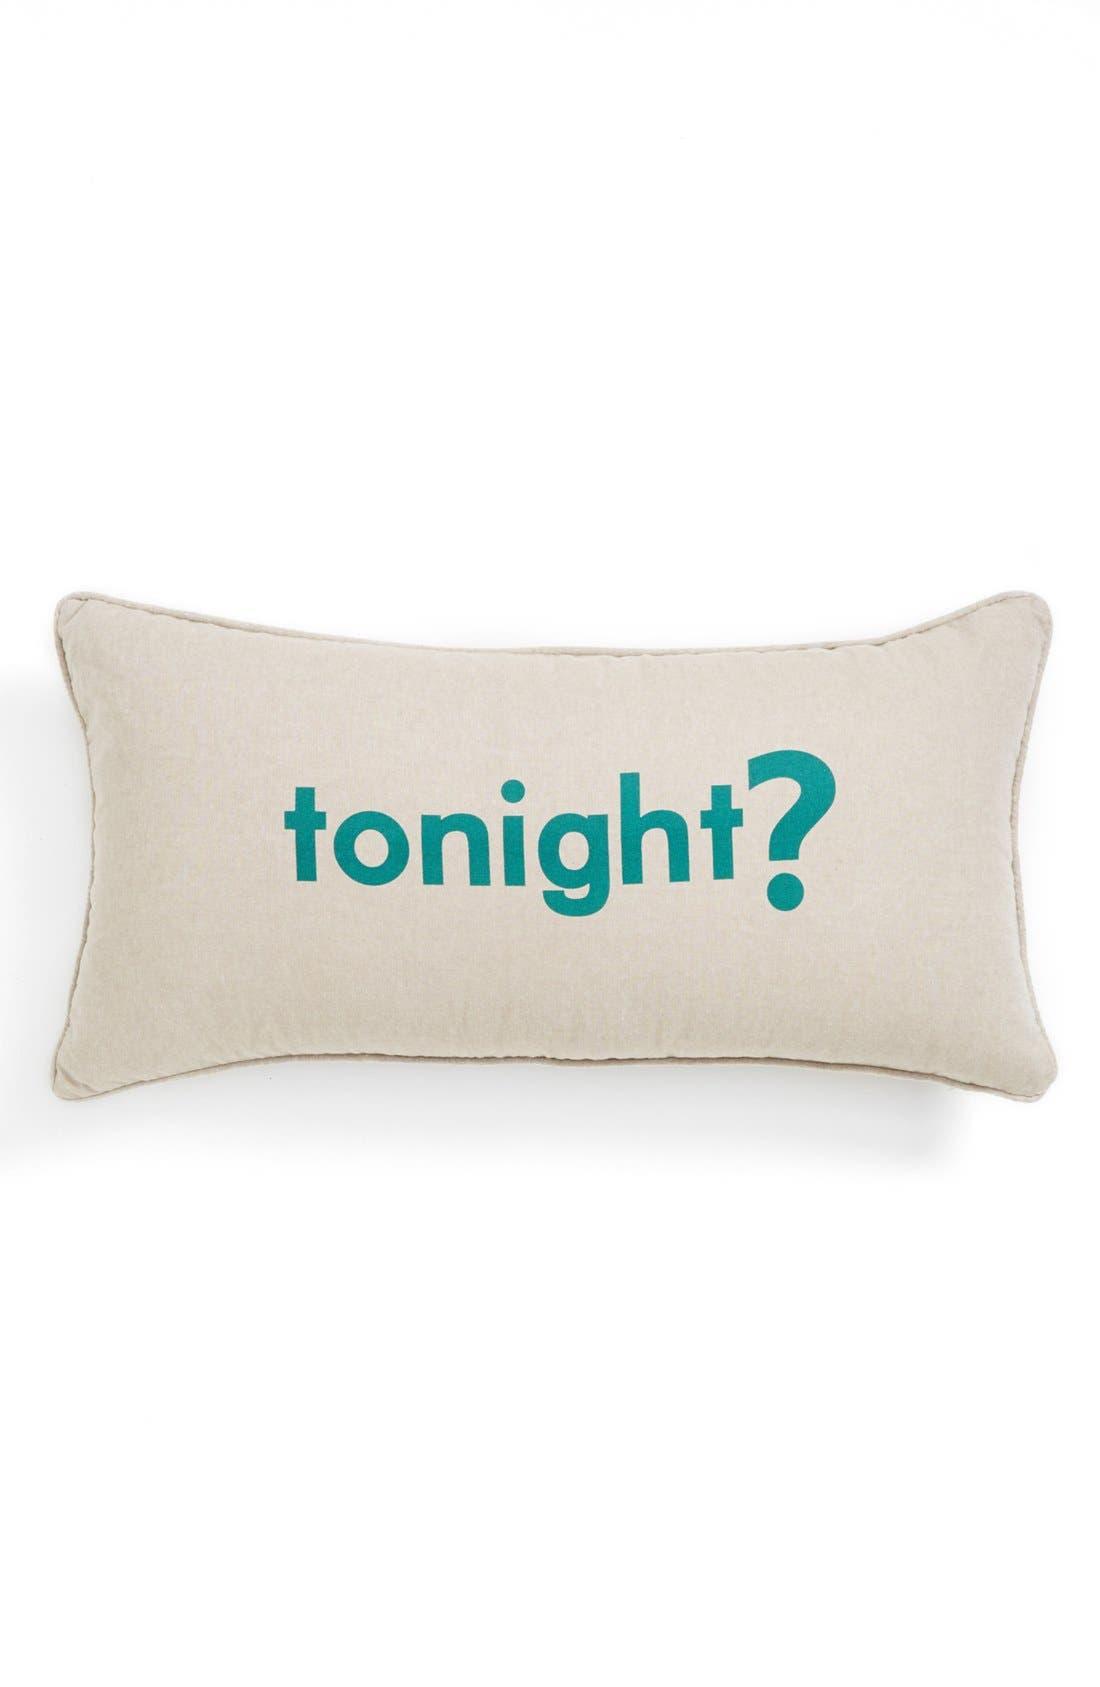 Alternate Image 1 Selected - Levtex 'Tonight/Not Tonight' Pillow